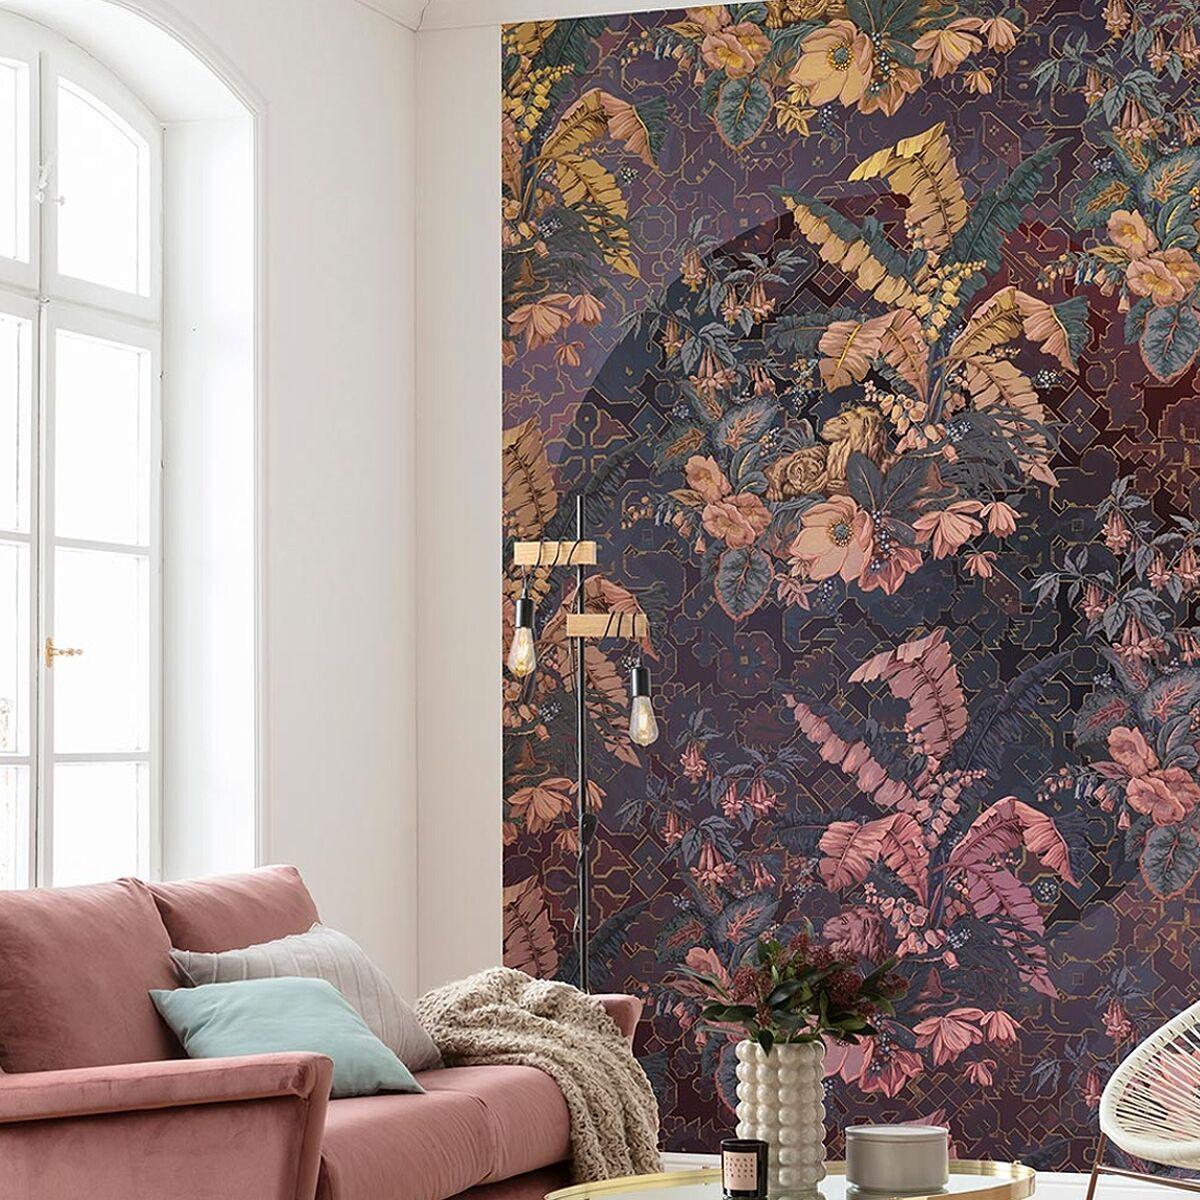 Orient Violet Col 1 Tapeten Fototapete Und Floral Muster